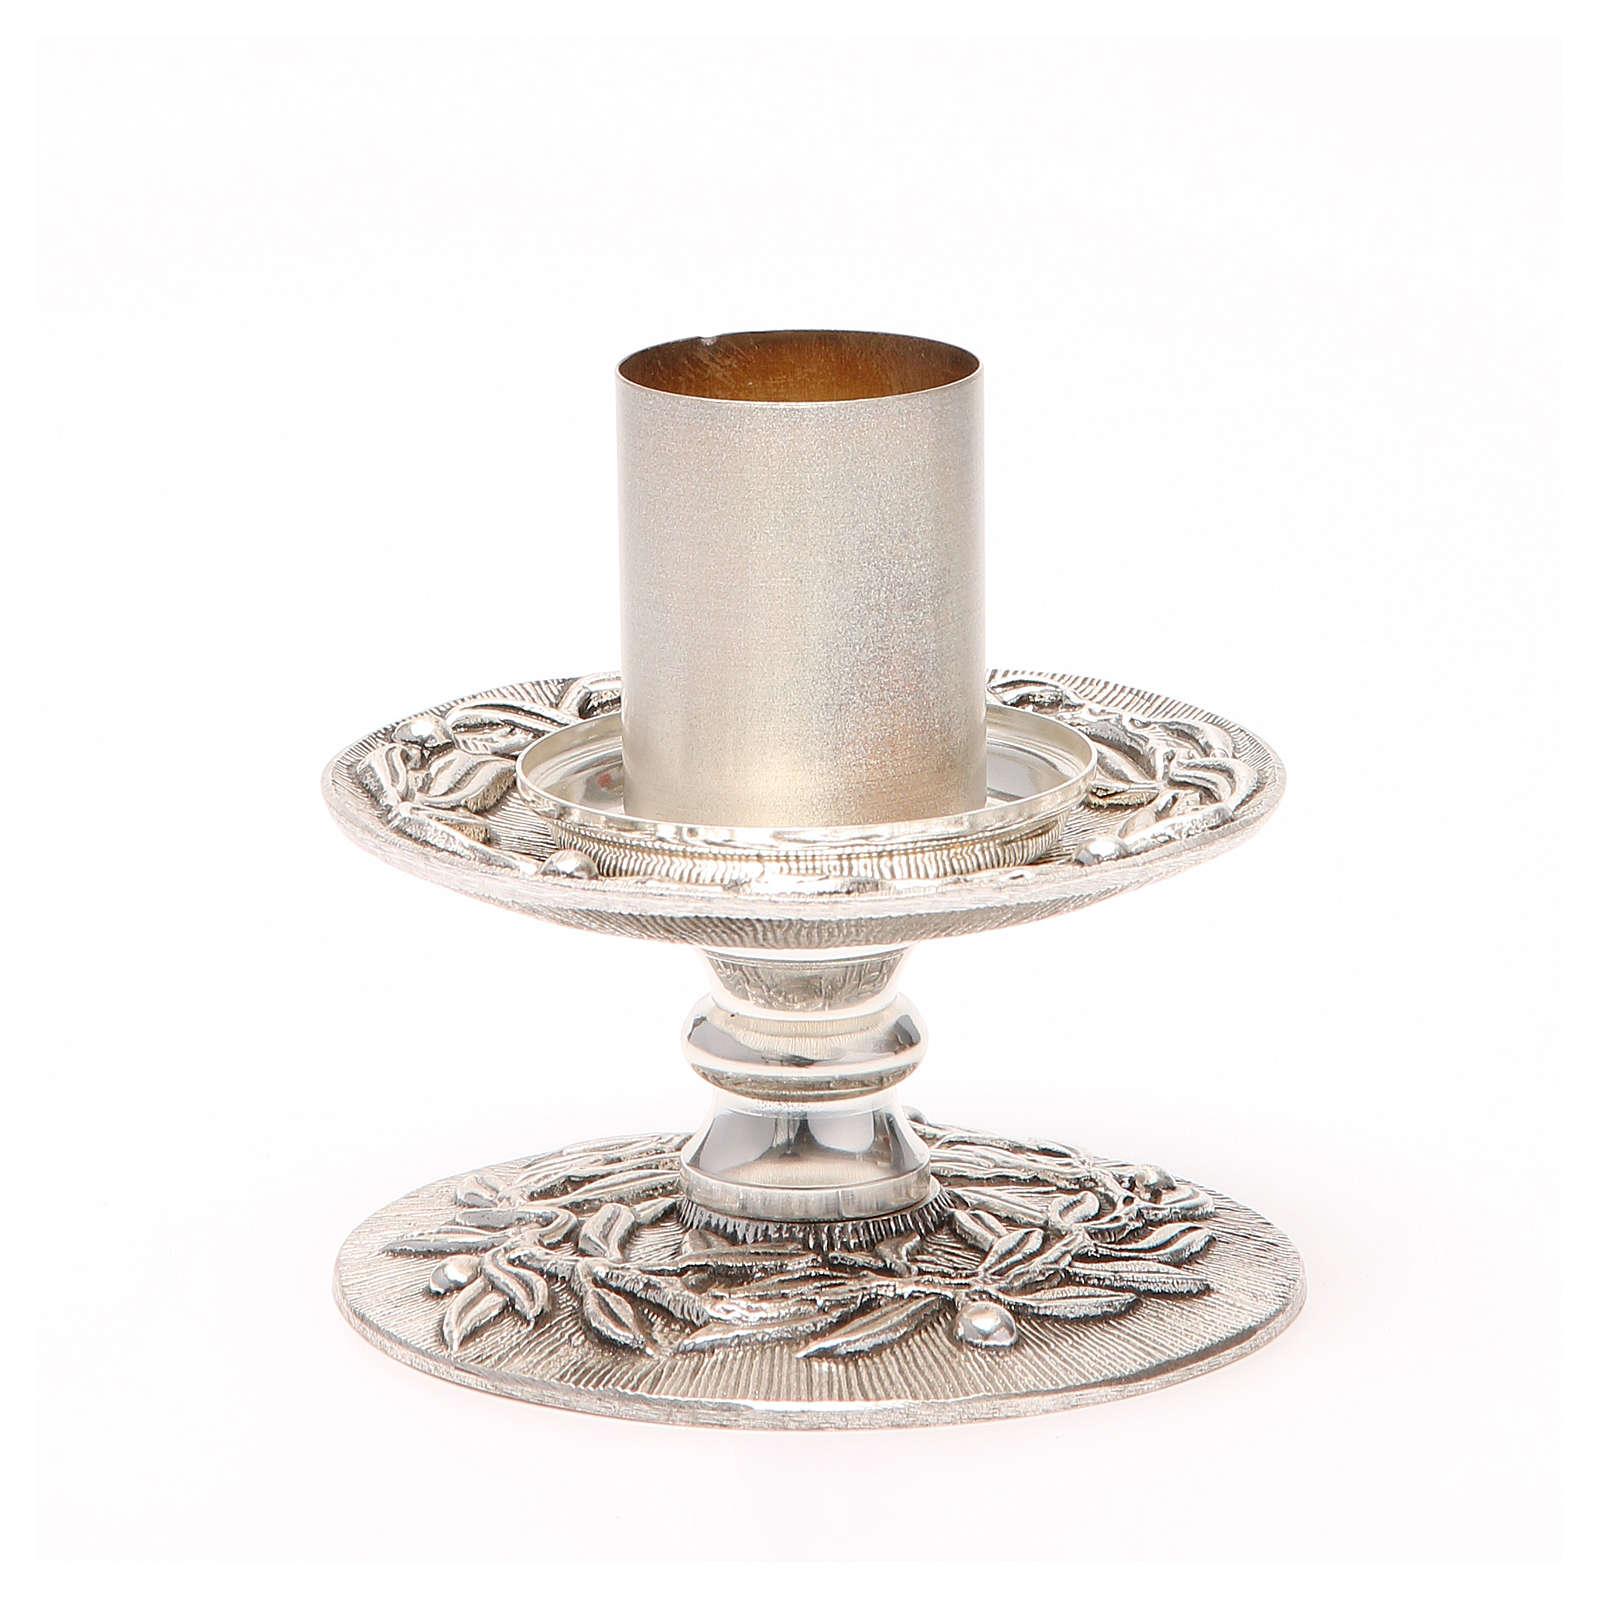 Portacandela bronzo argentato rami d'ulivo 4